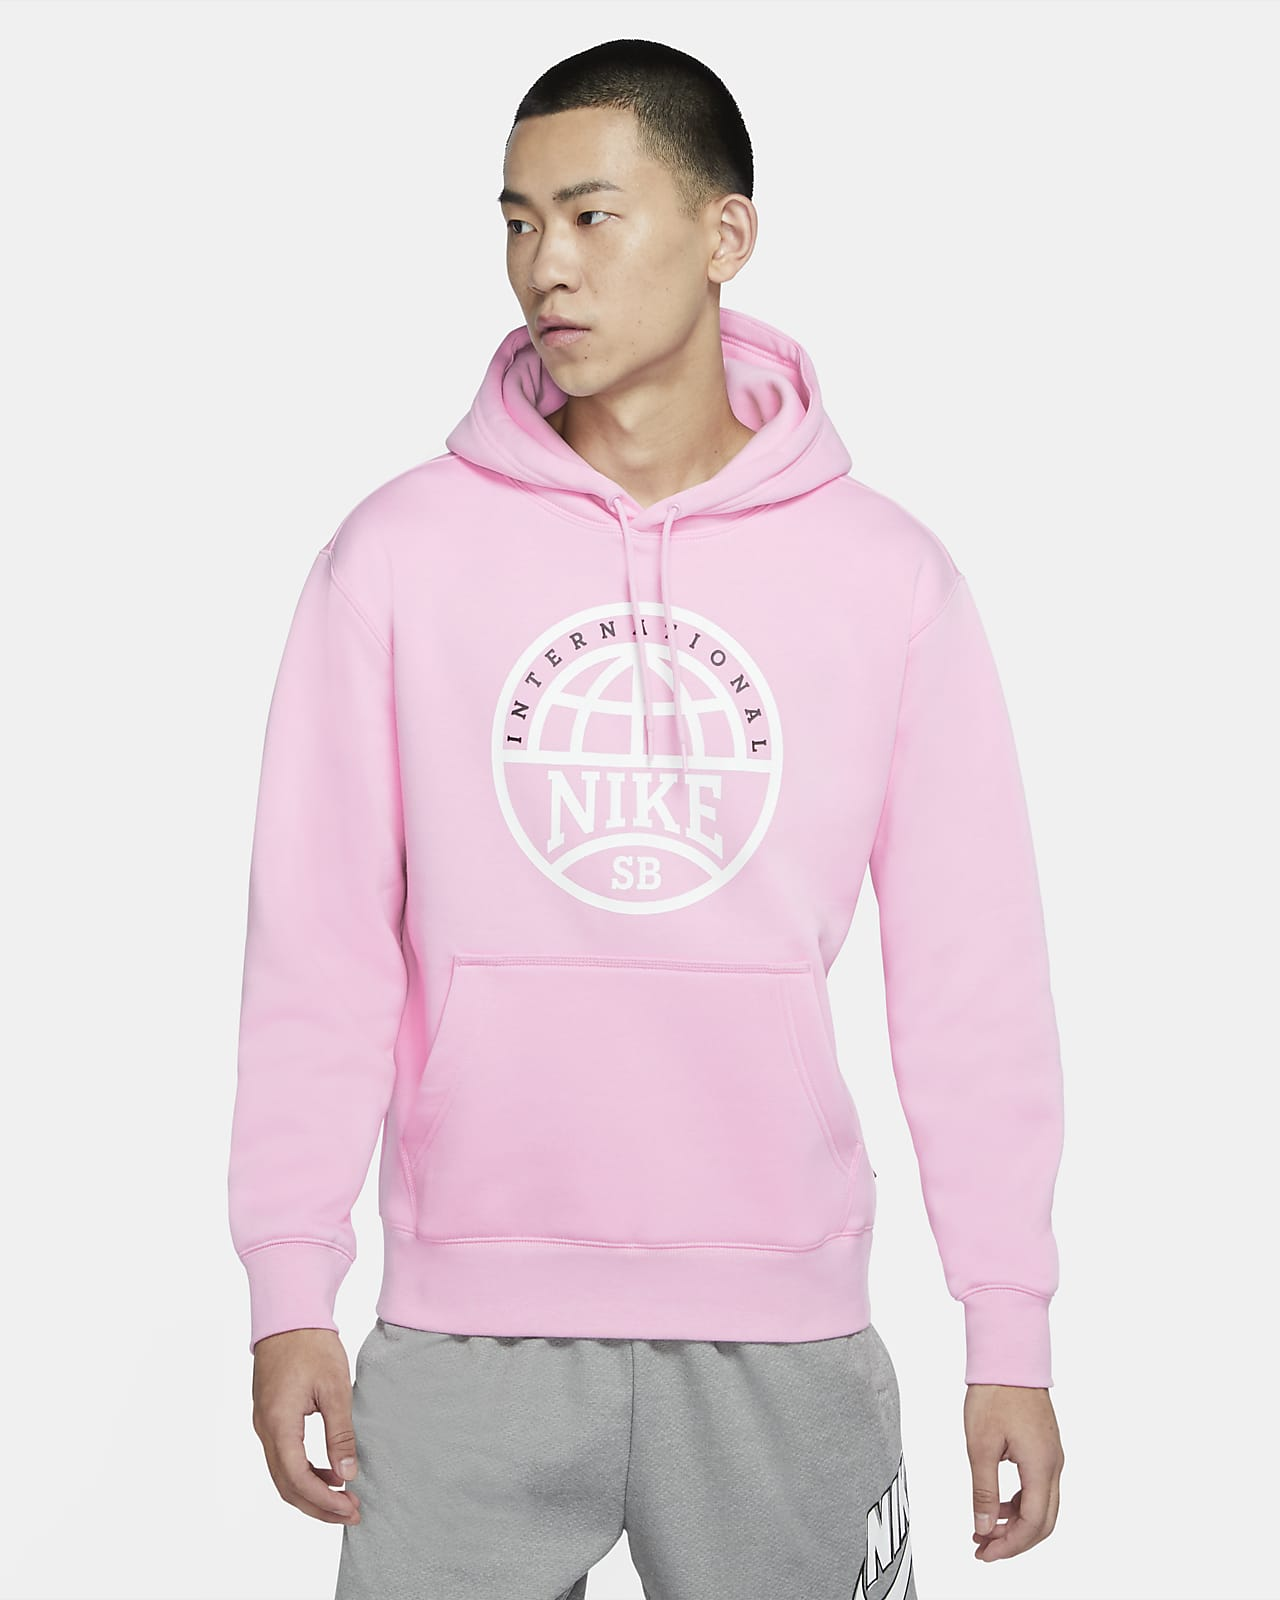 Nike SB Men's Graphic Skate Hoodie